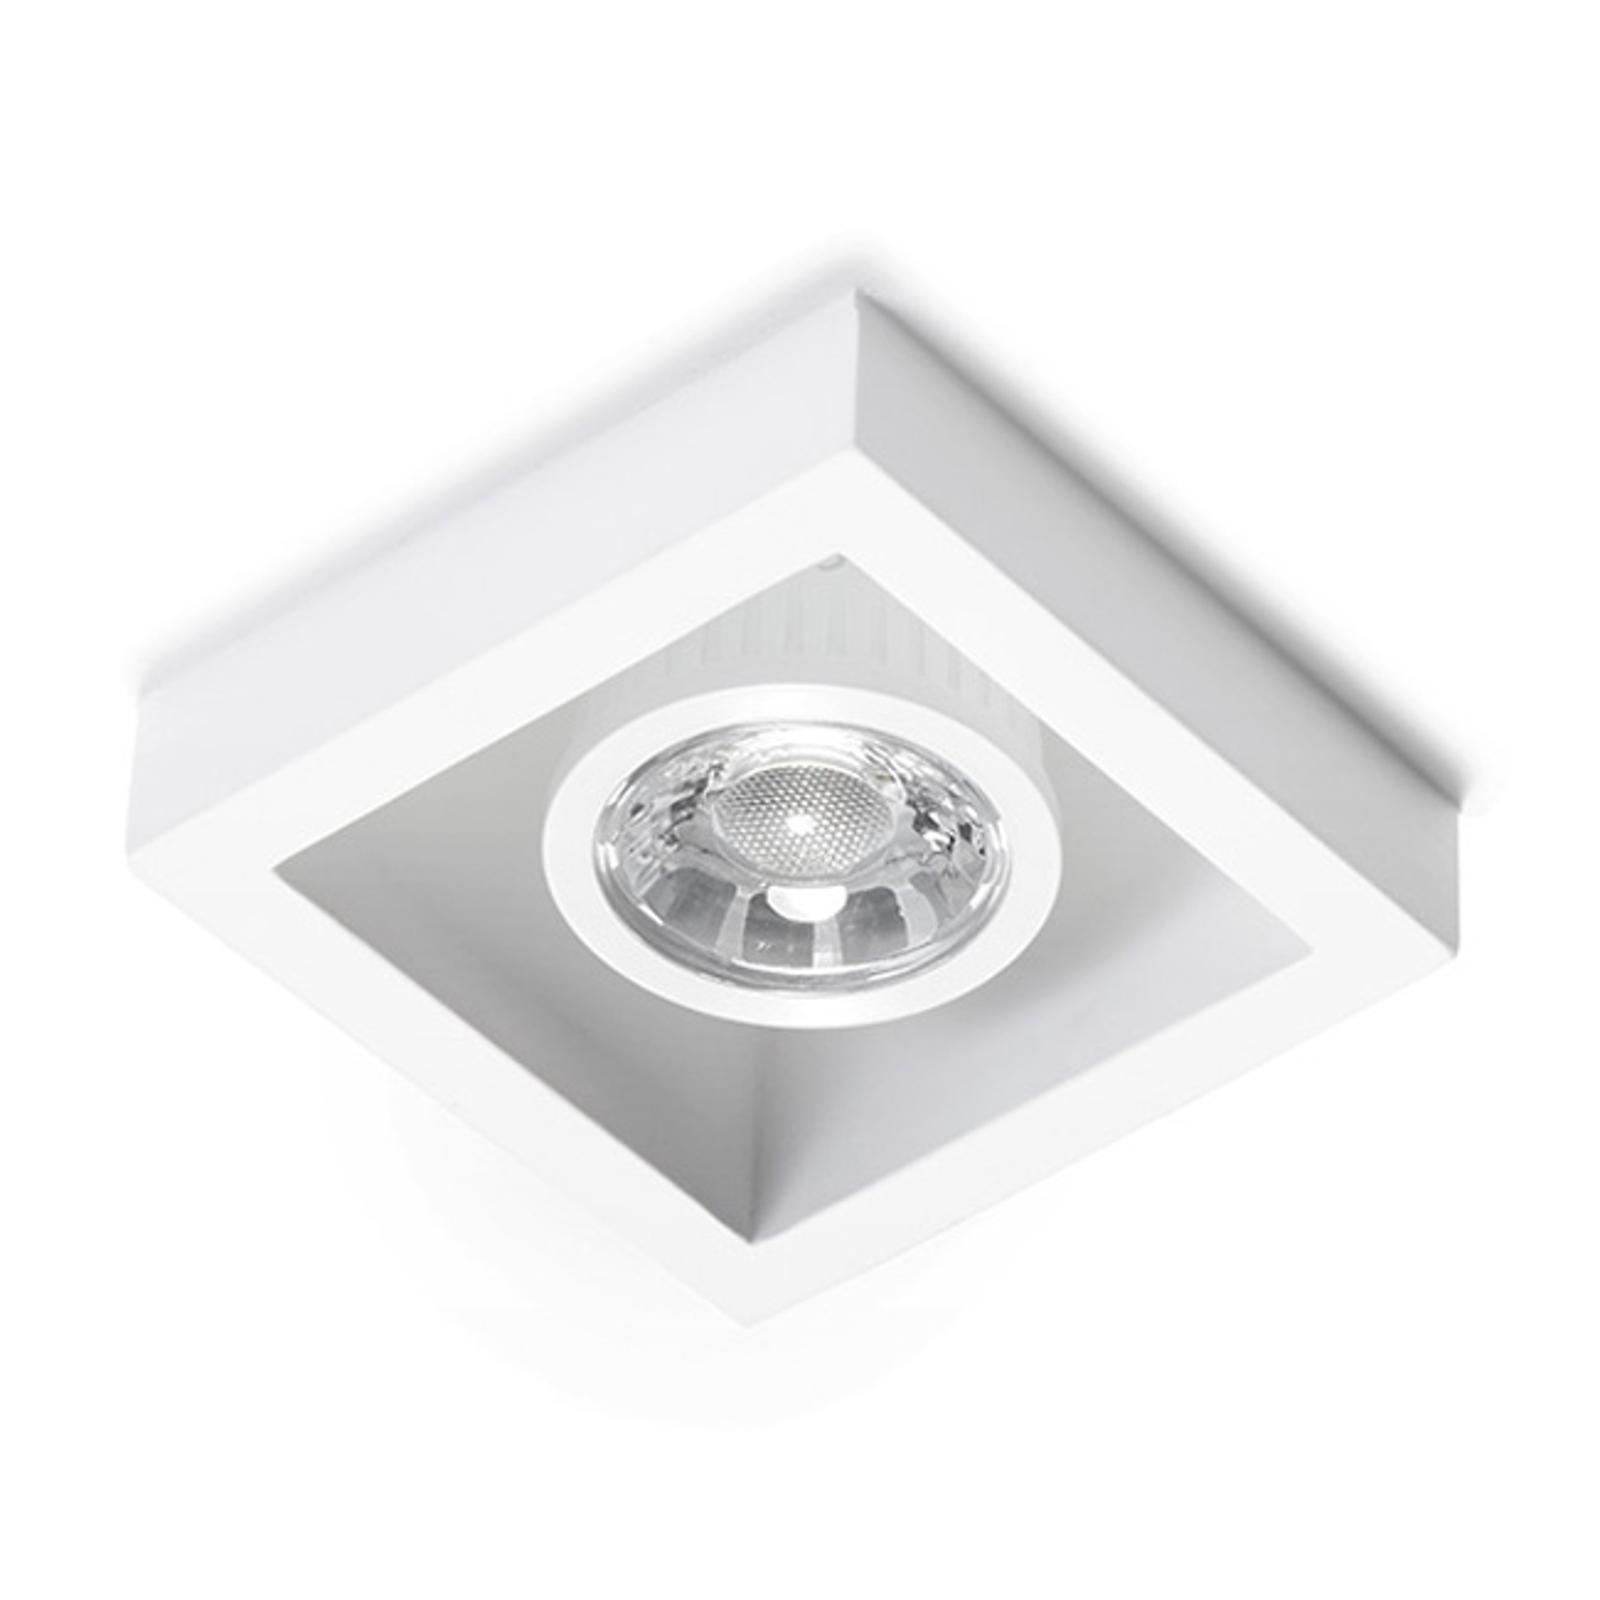 Plafondinbouwspot Olympia_ T234 1-lamp